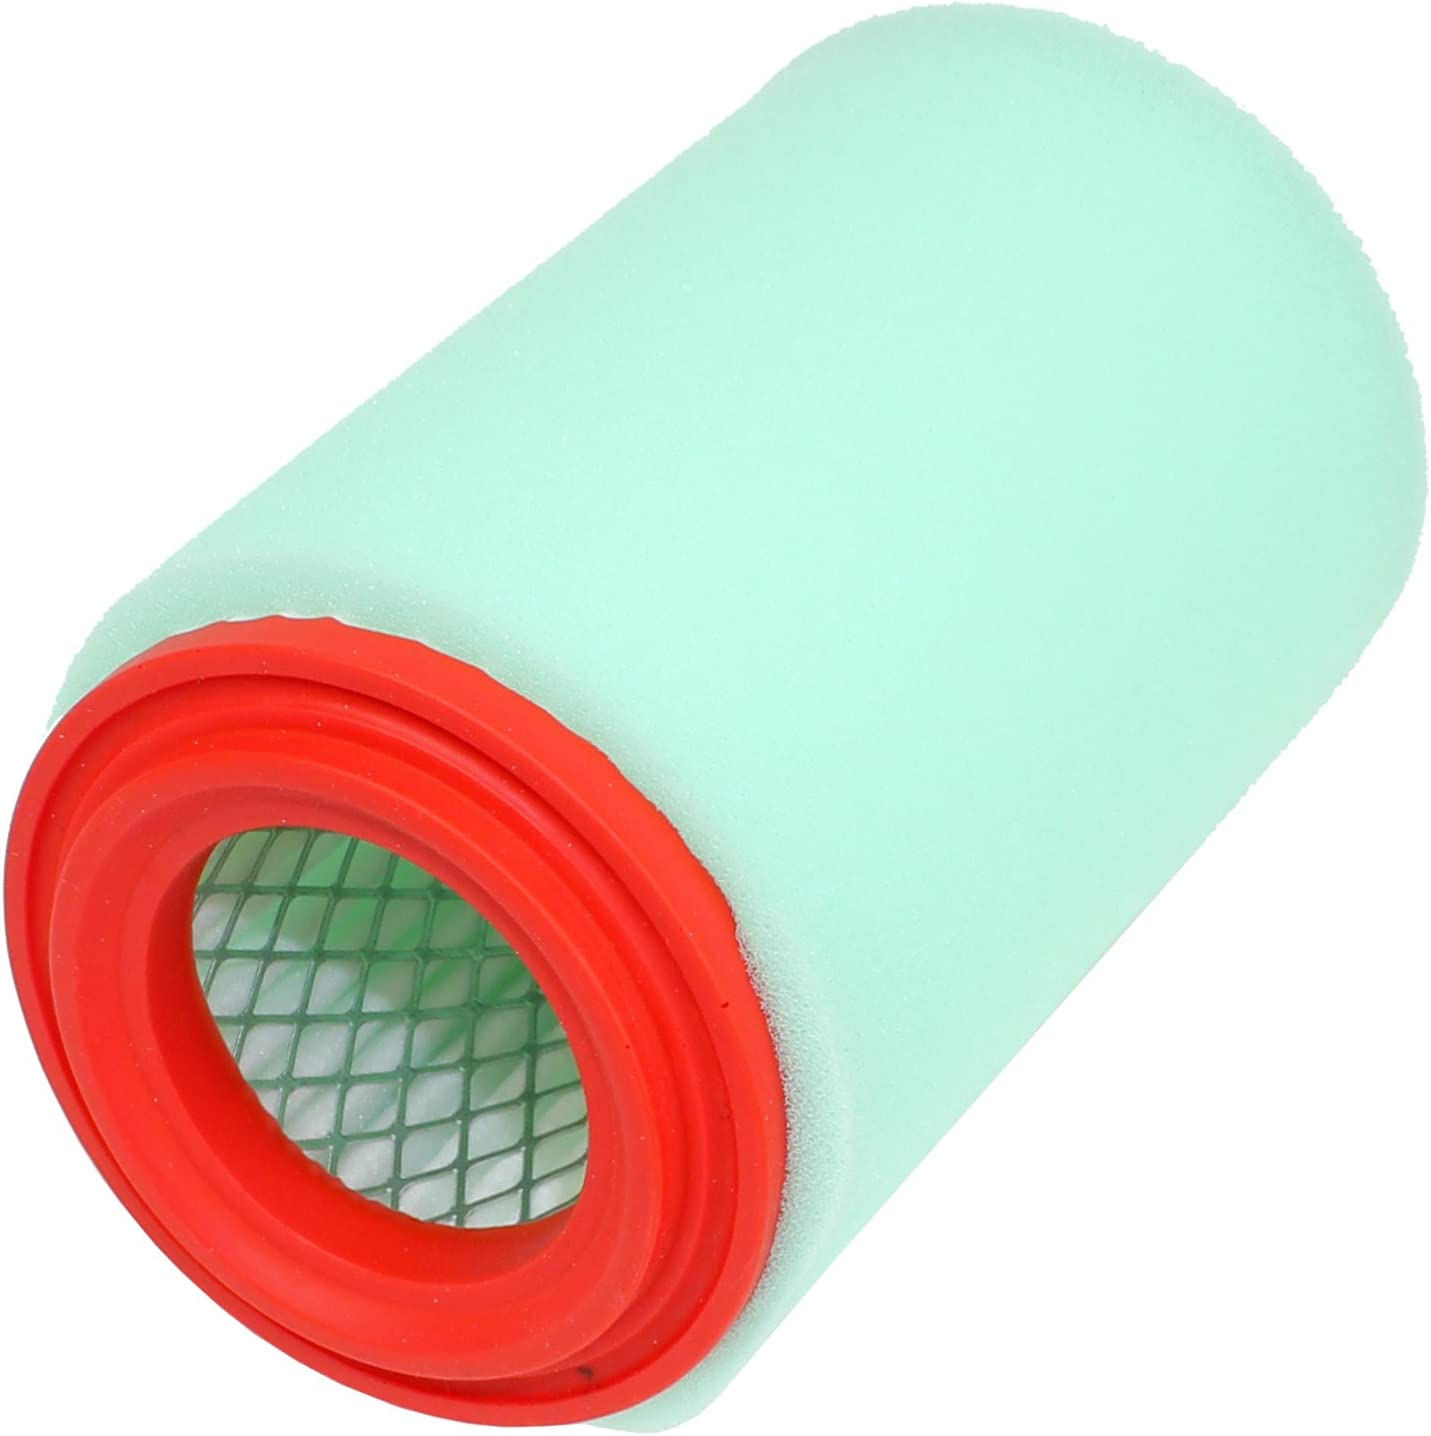 Air Filter Cleaner for Yamaha 1P0-E4450-00-00 Big Bear 250 /& 400 Bear Tracker